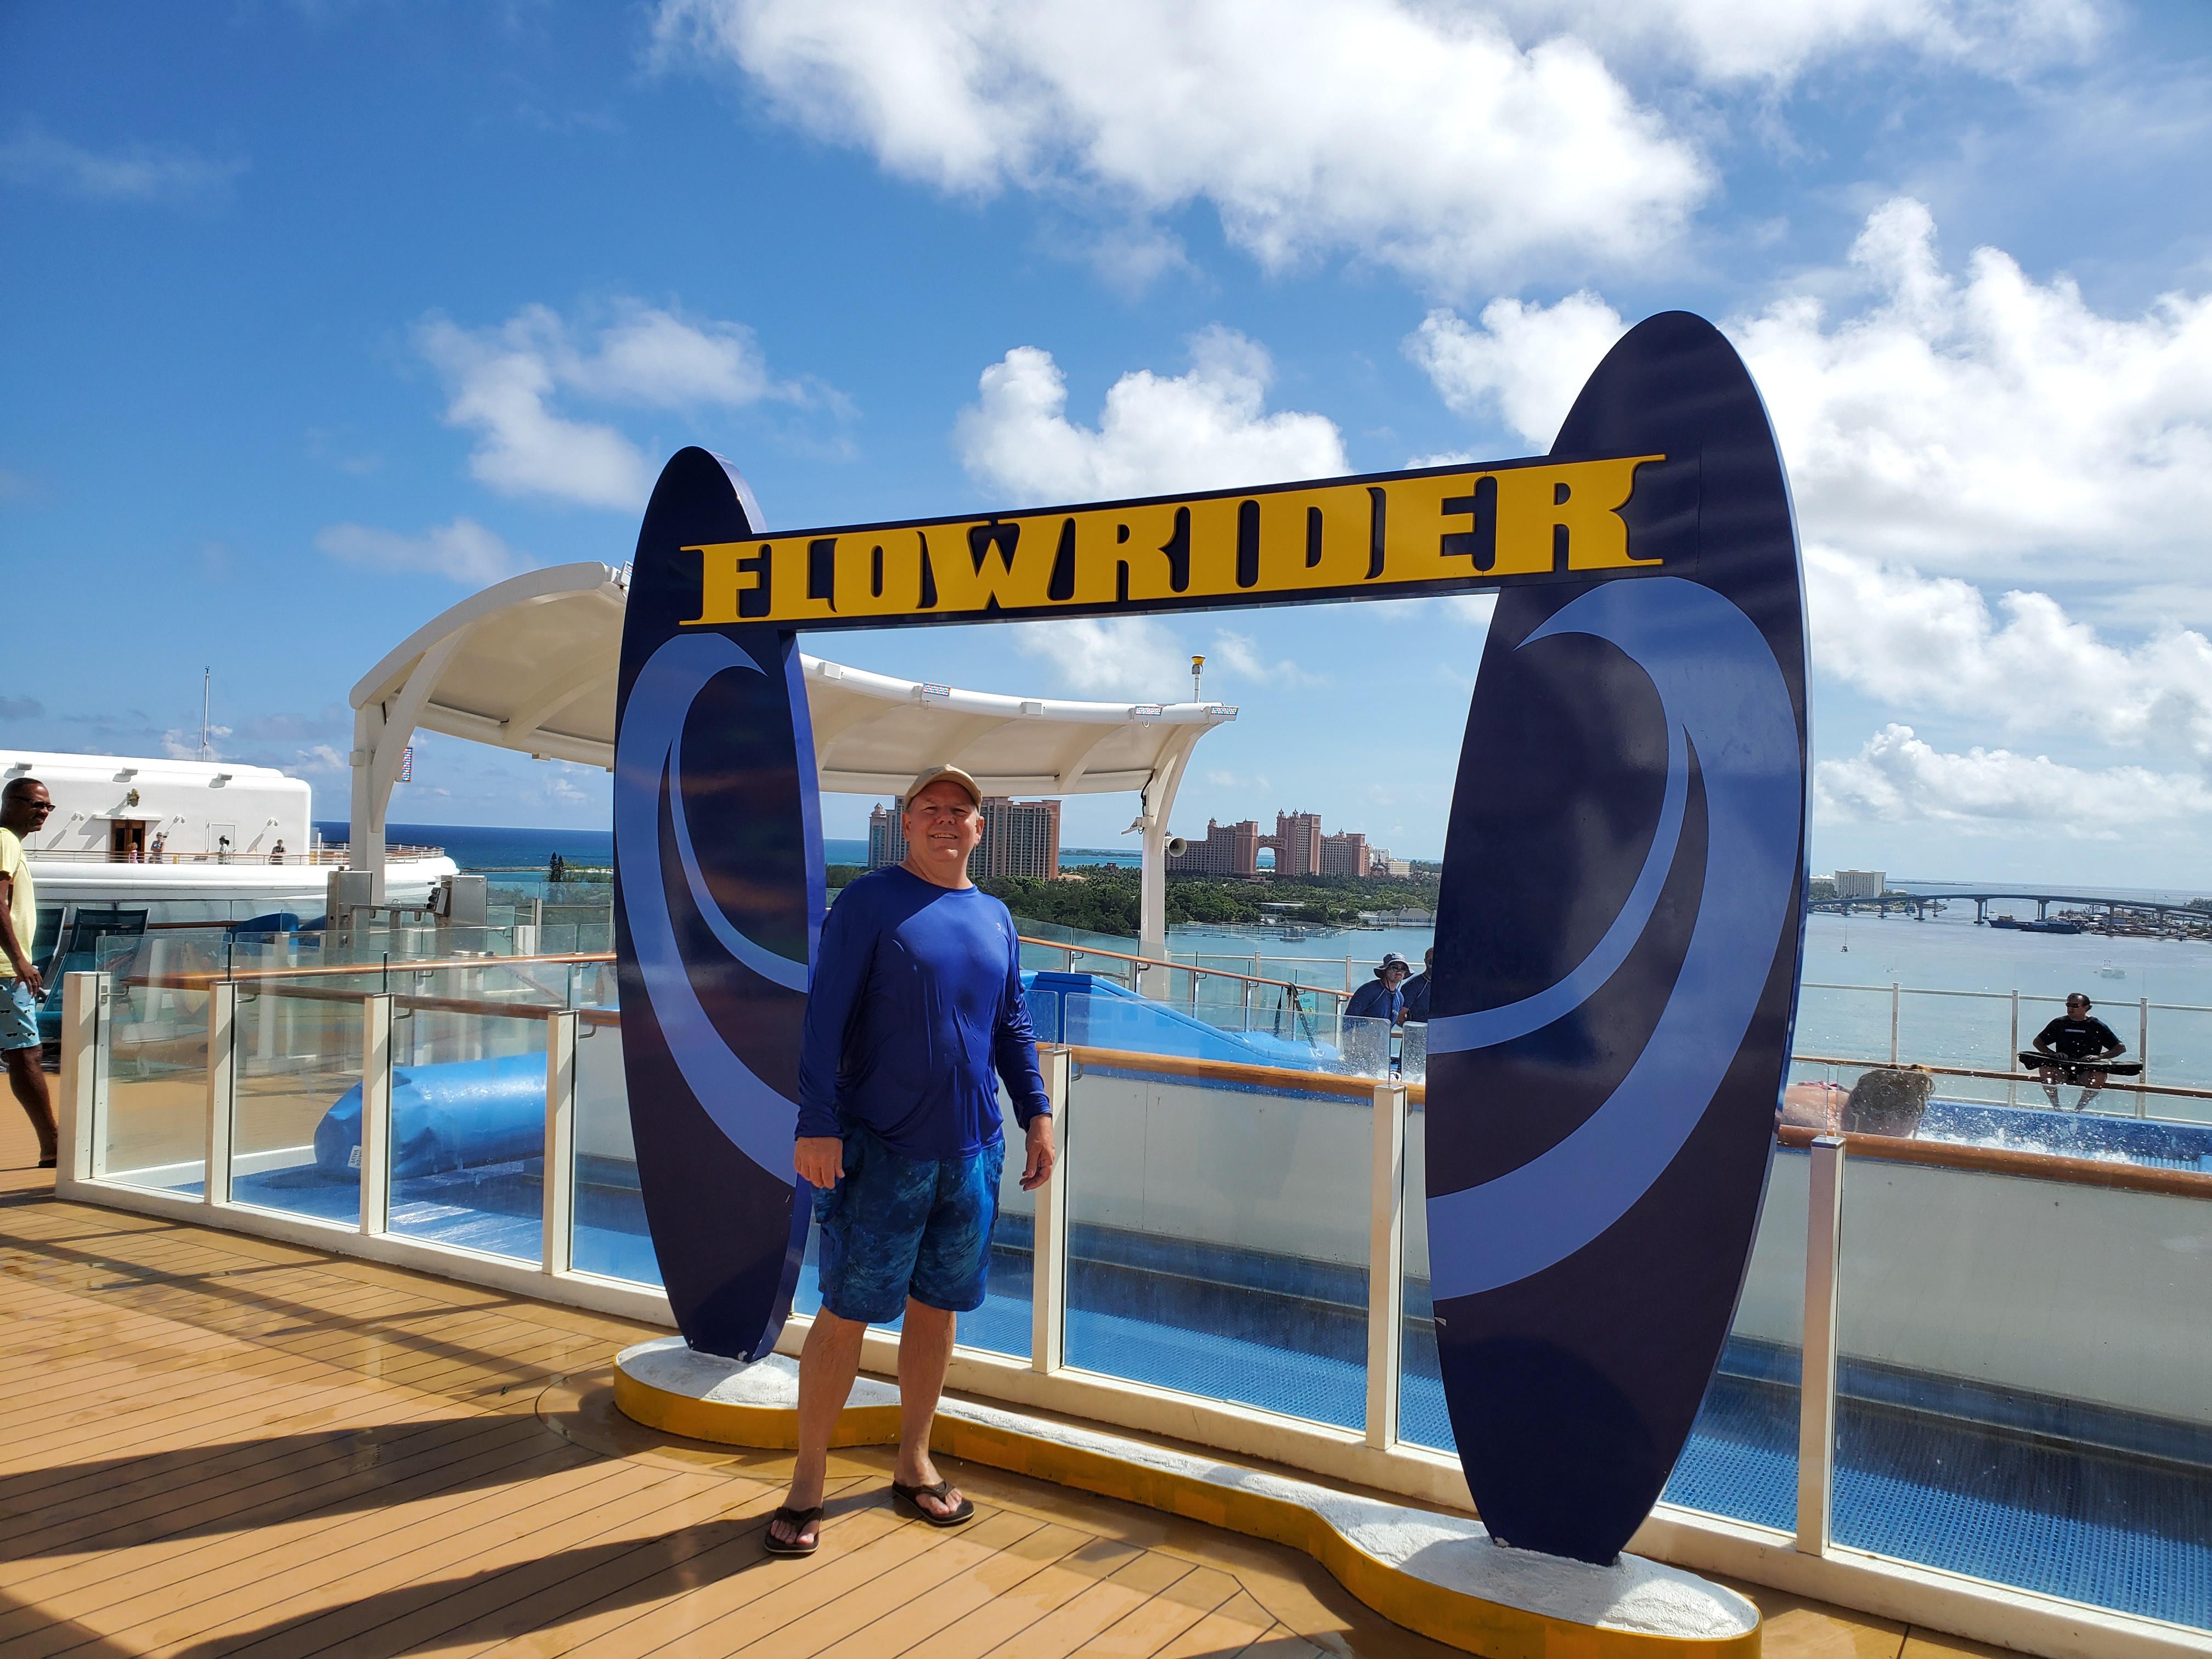 Mastered the FlowRider